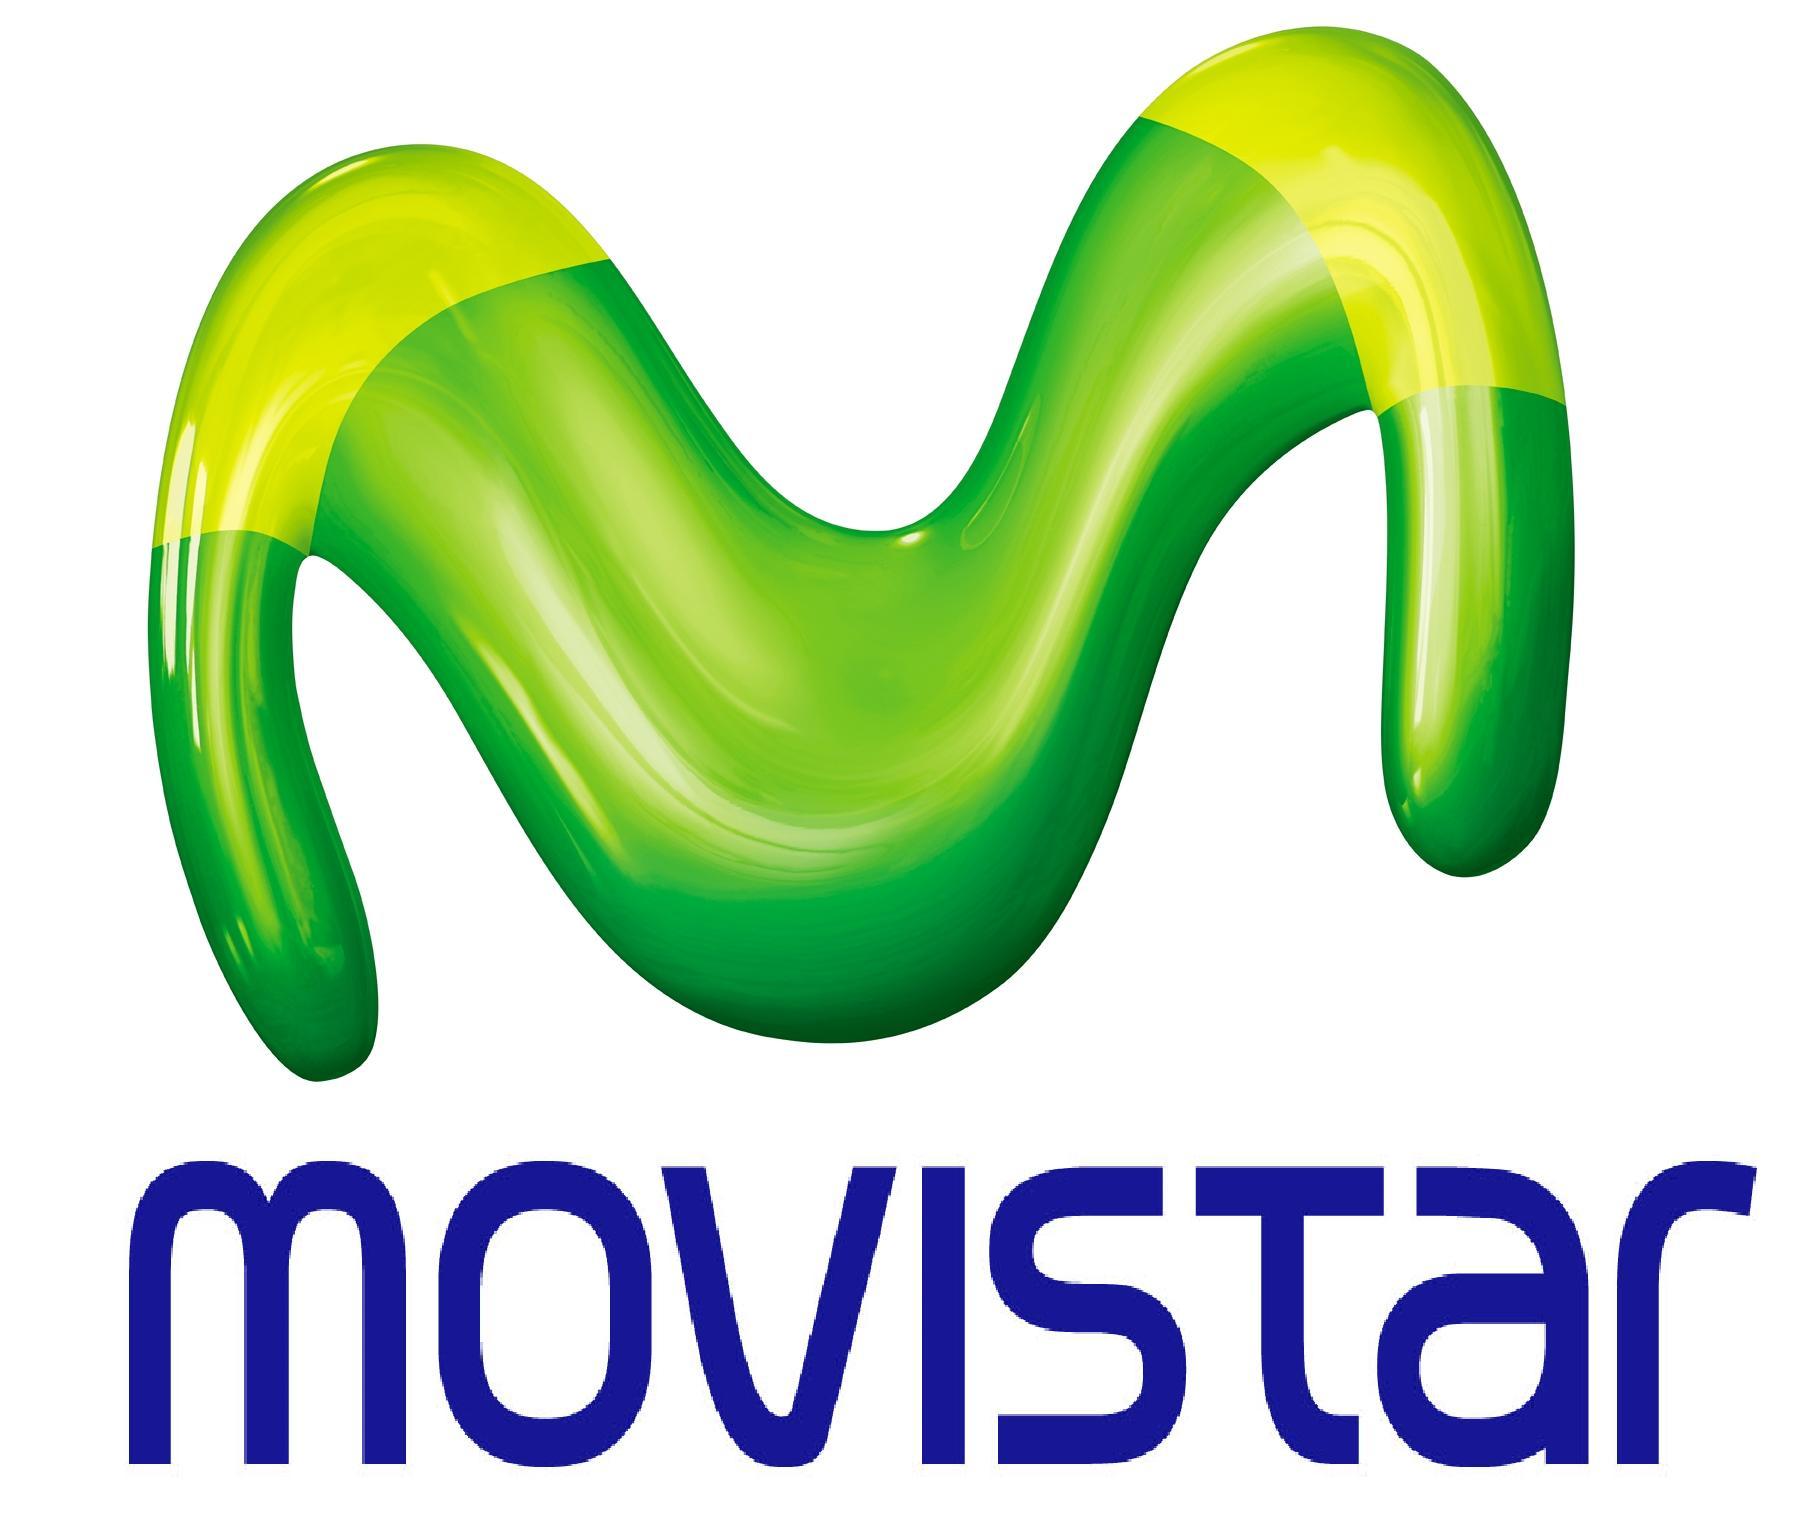 www.tecnologiadetuatu.elcorteingles.es/wp-content/uploads/LogoMovistar.jpg